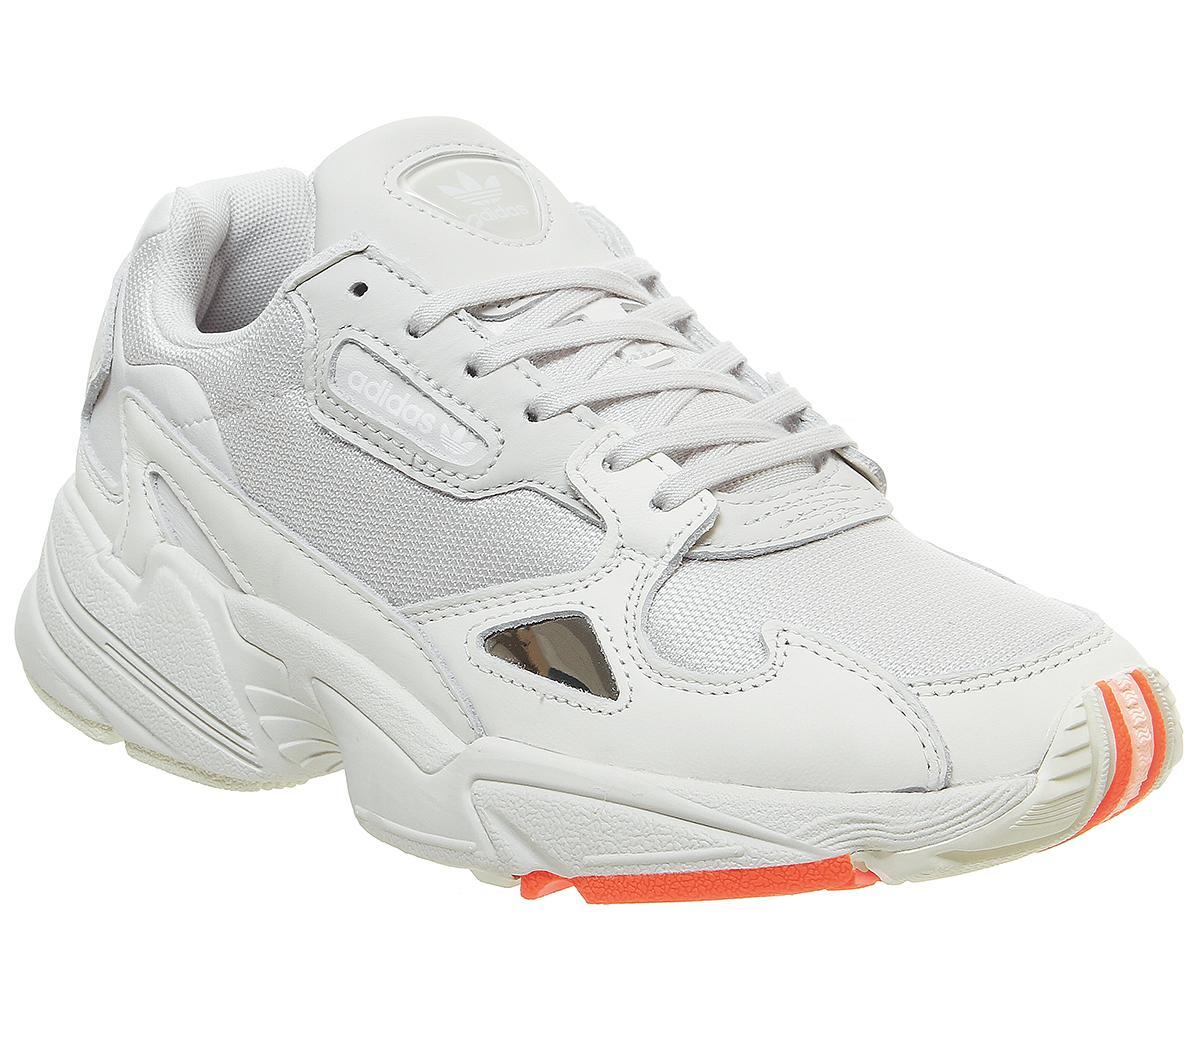 adidas falcon junior trainers